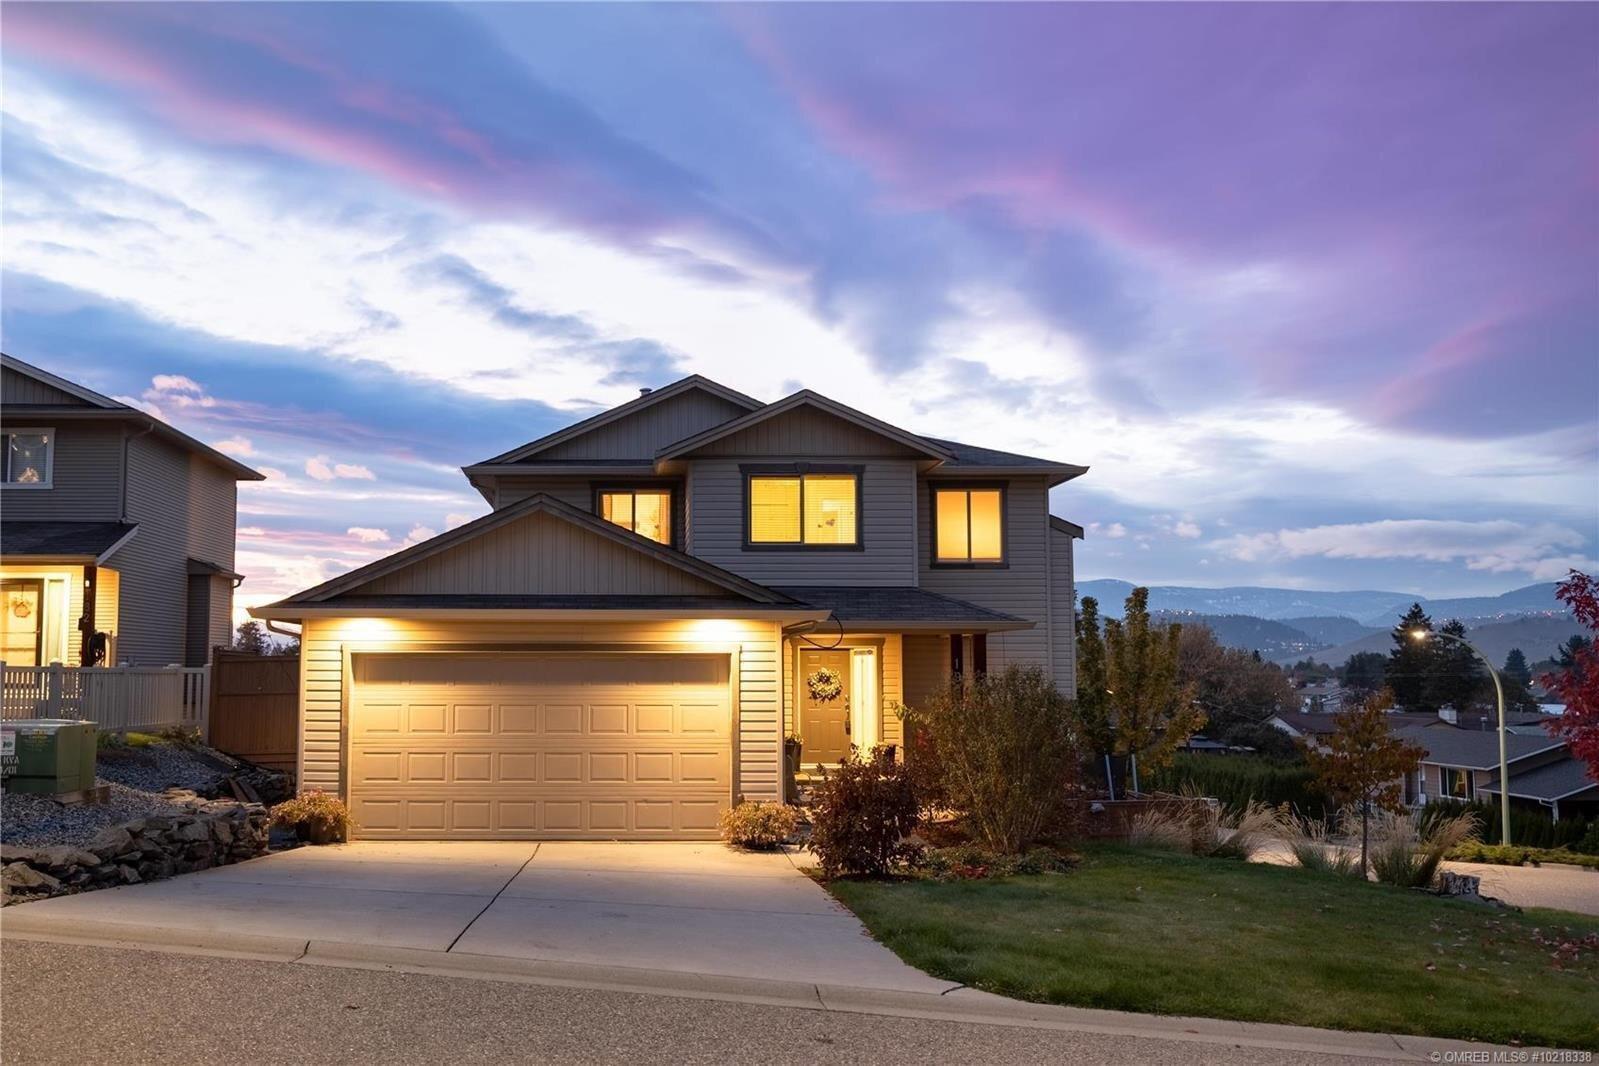 House for sale at 194 Poonian Ct Kelowna British Columbia - MLS: 10218338